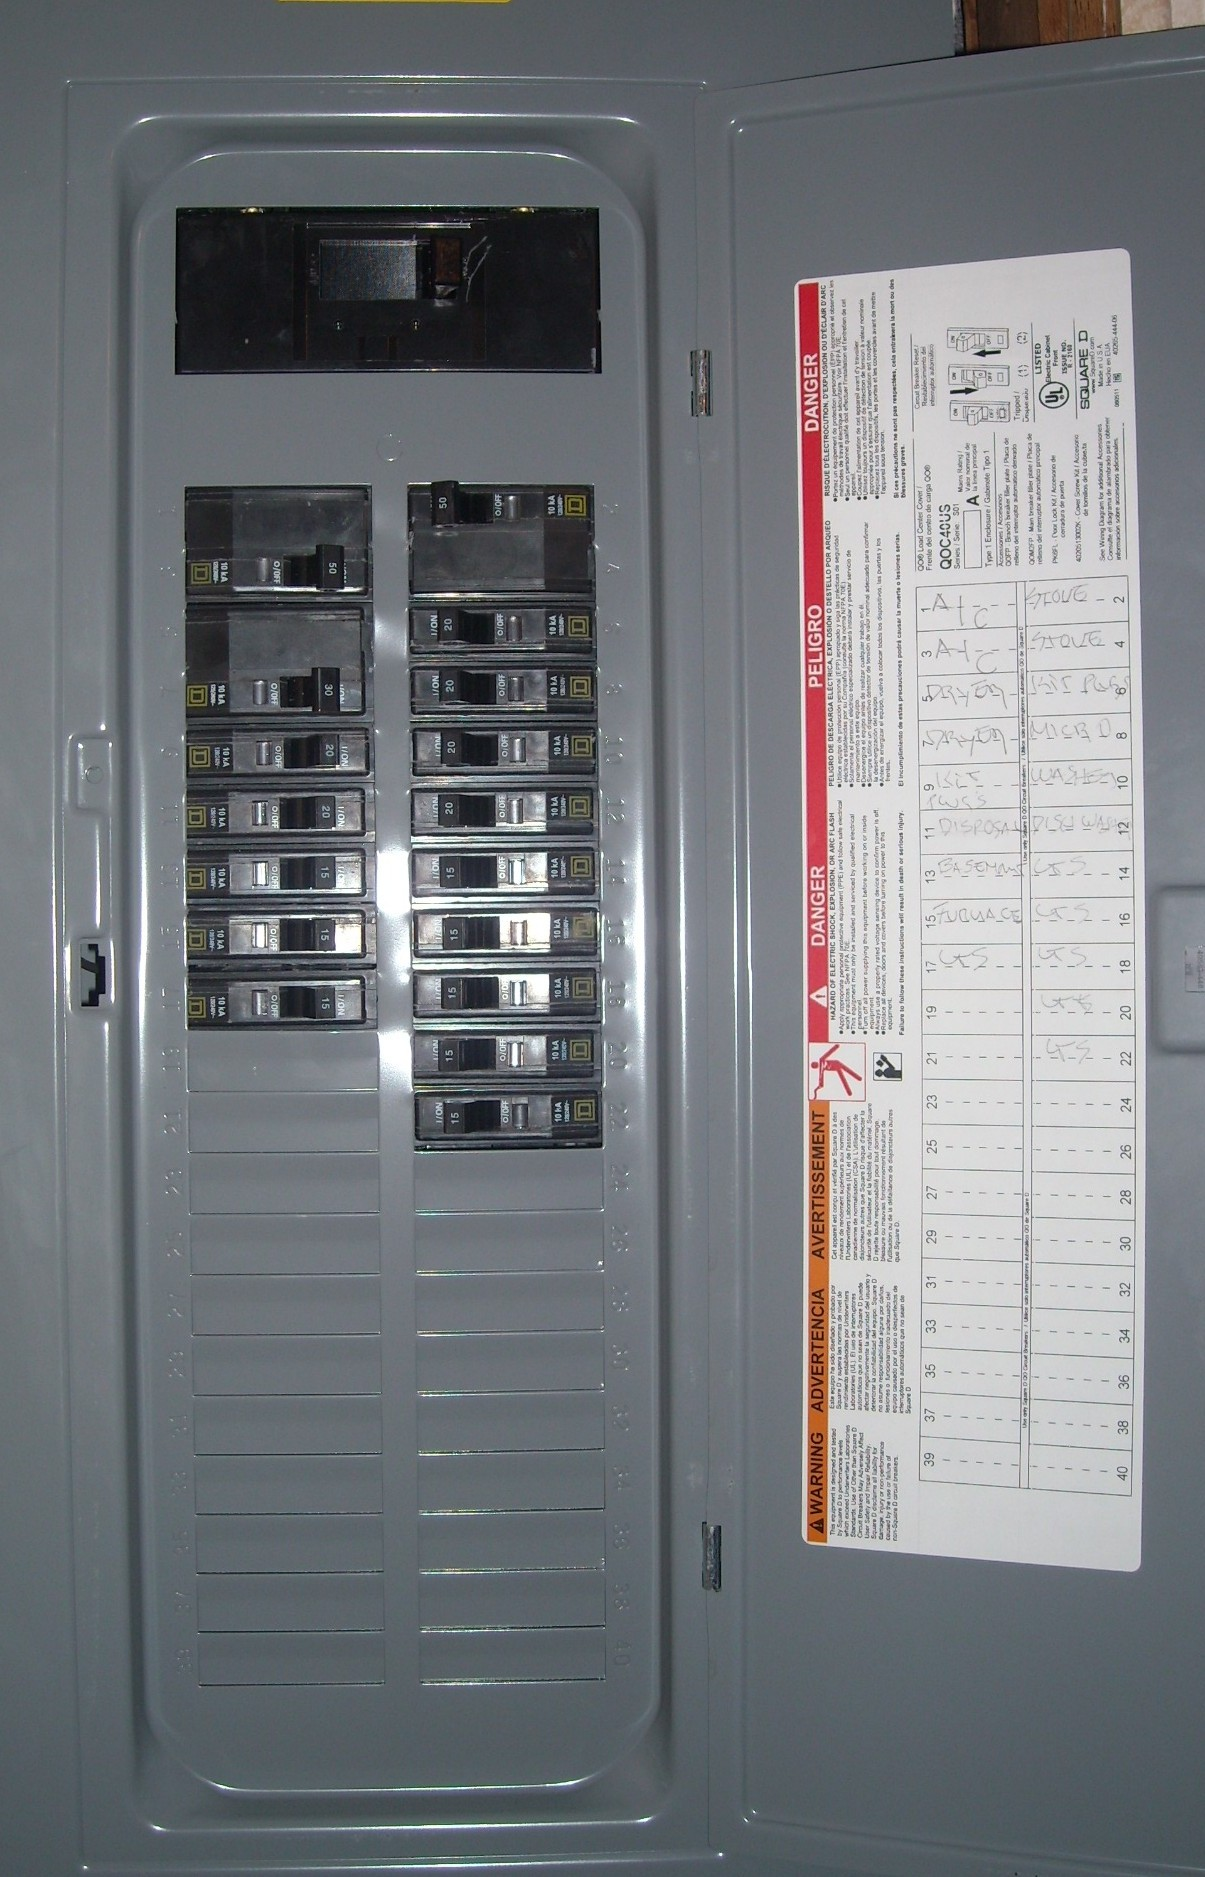 hot water heater fuse box data wiring diagram water heater down pipe hot  water fuse box